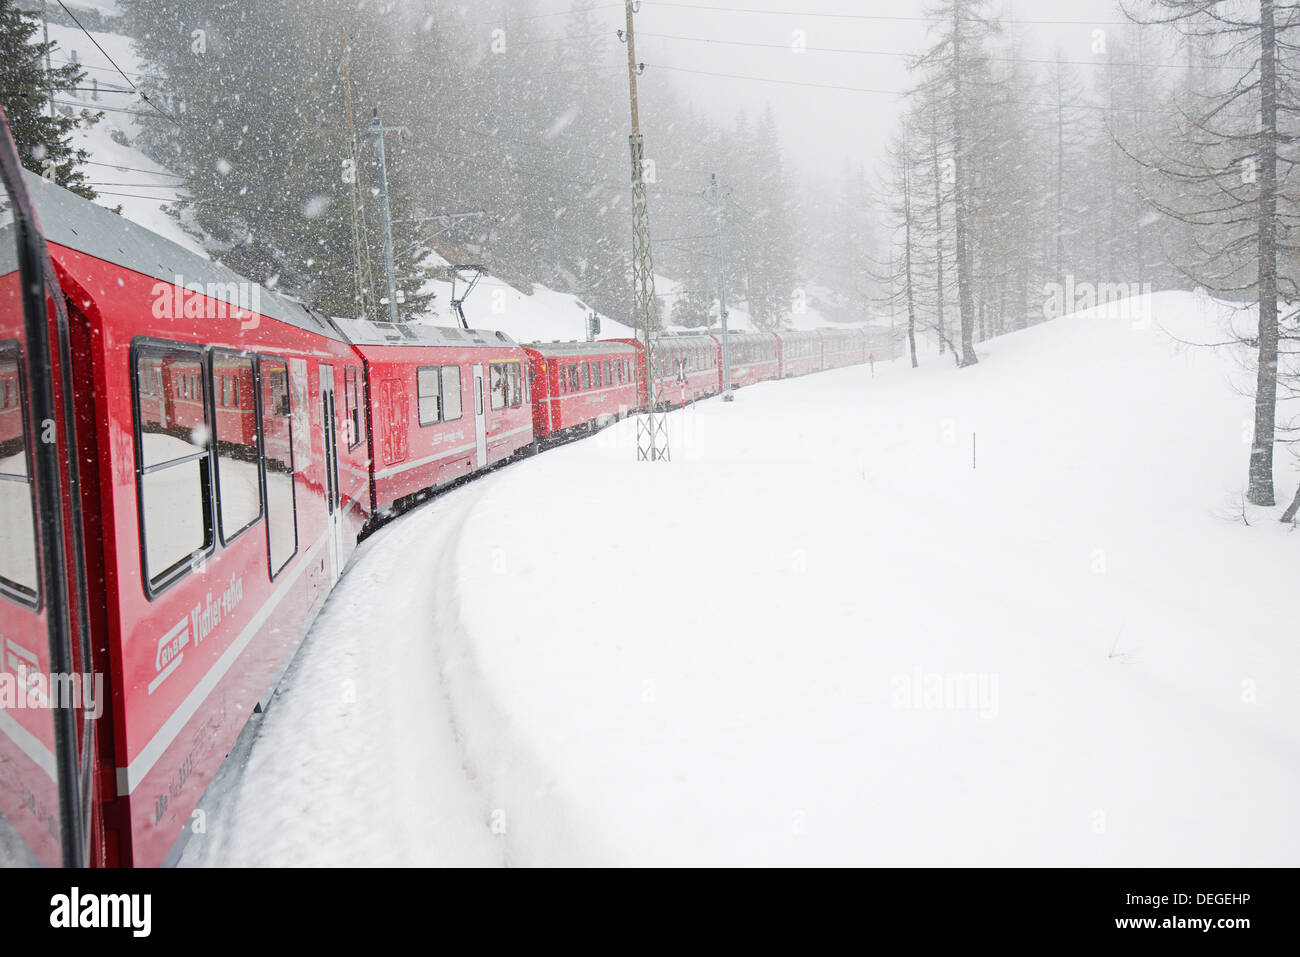 Bernina Railway Line, UNESCO World Heritage Site, Graubunden, Swiss Alps, Switzerland, Europe - Stock Image